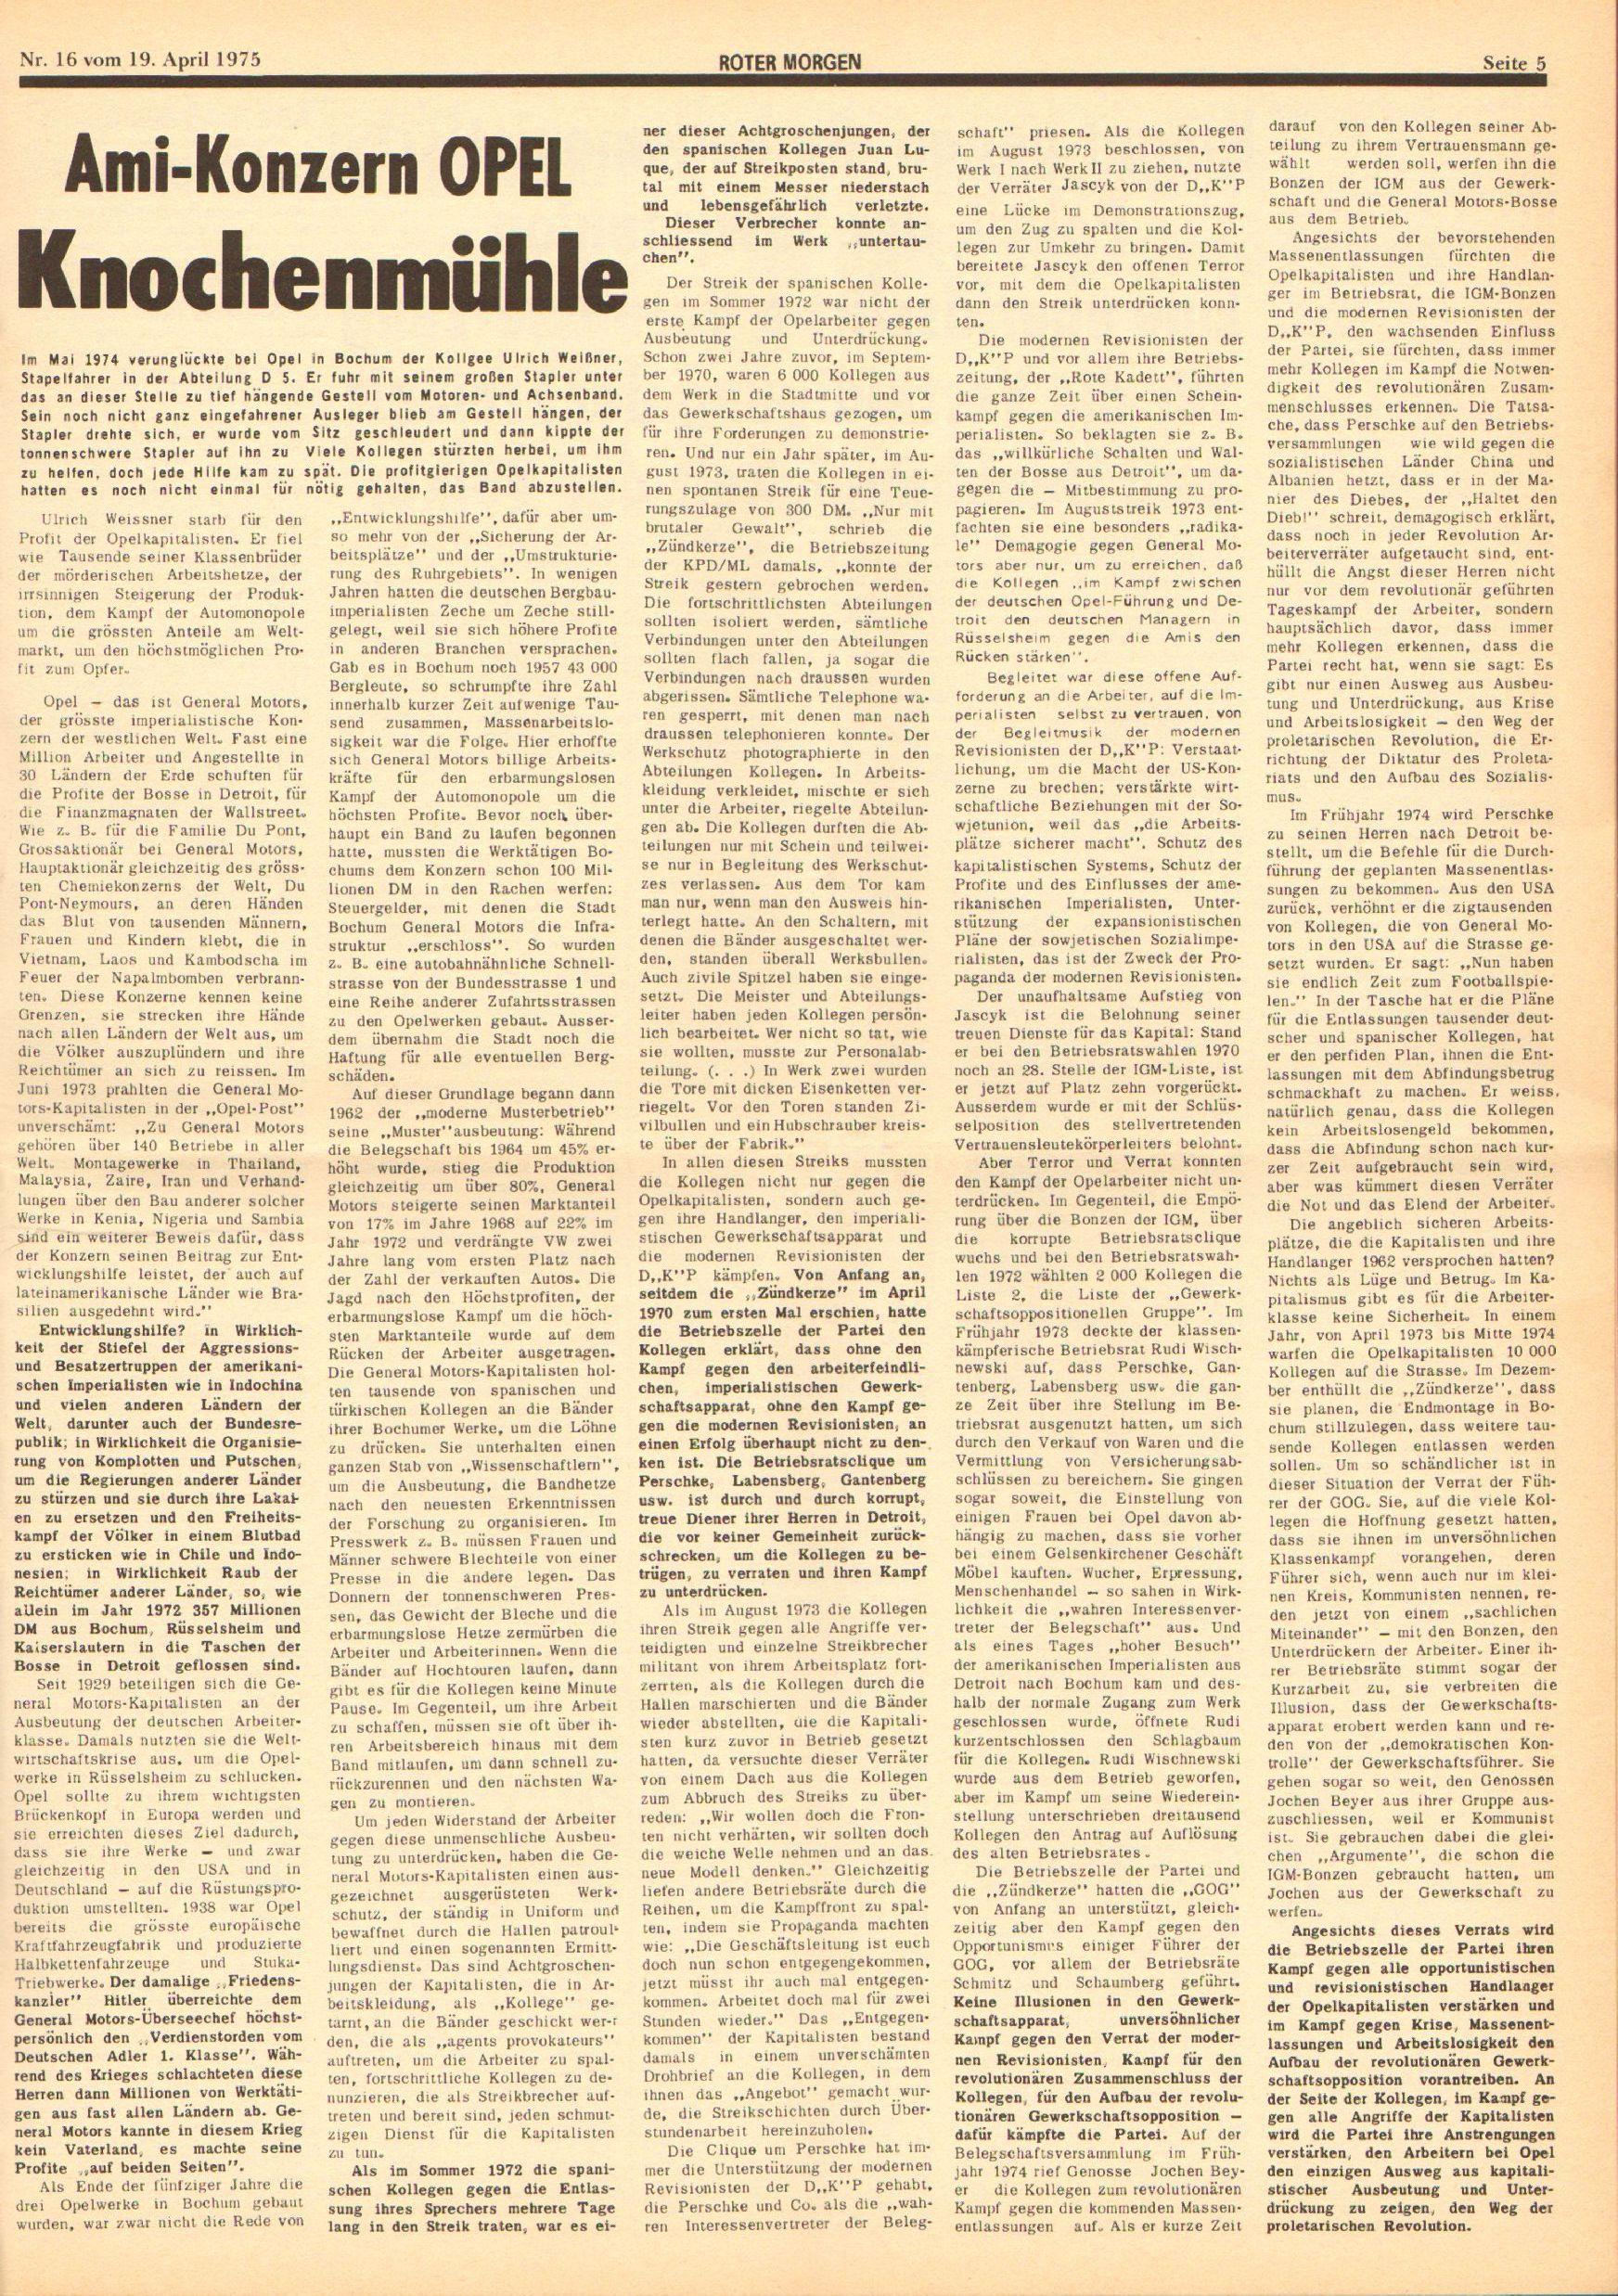 Roter Morgen, 9. Jg., 19. April 1975, Nr. 16, Seite 5